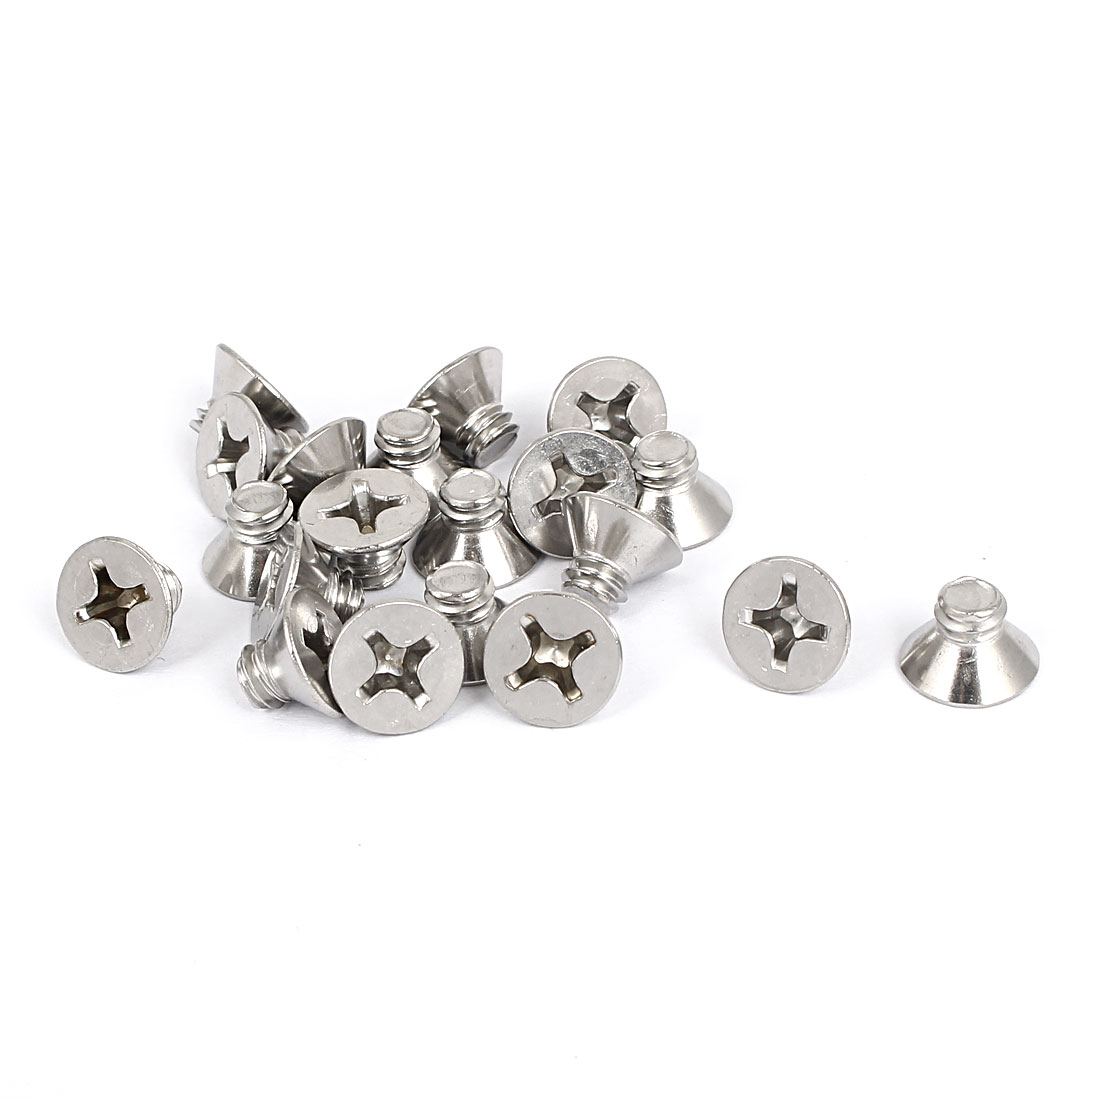 "1/4""-20x5/16"" 304 Stainless Steel Phillips Flat Countersunk Head Screws 20pcs"